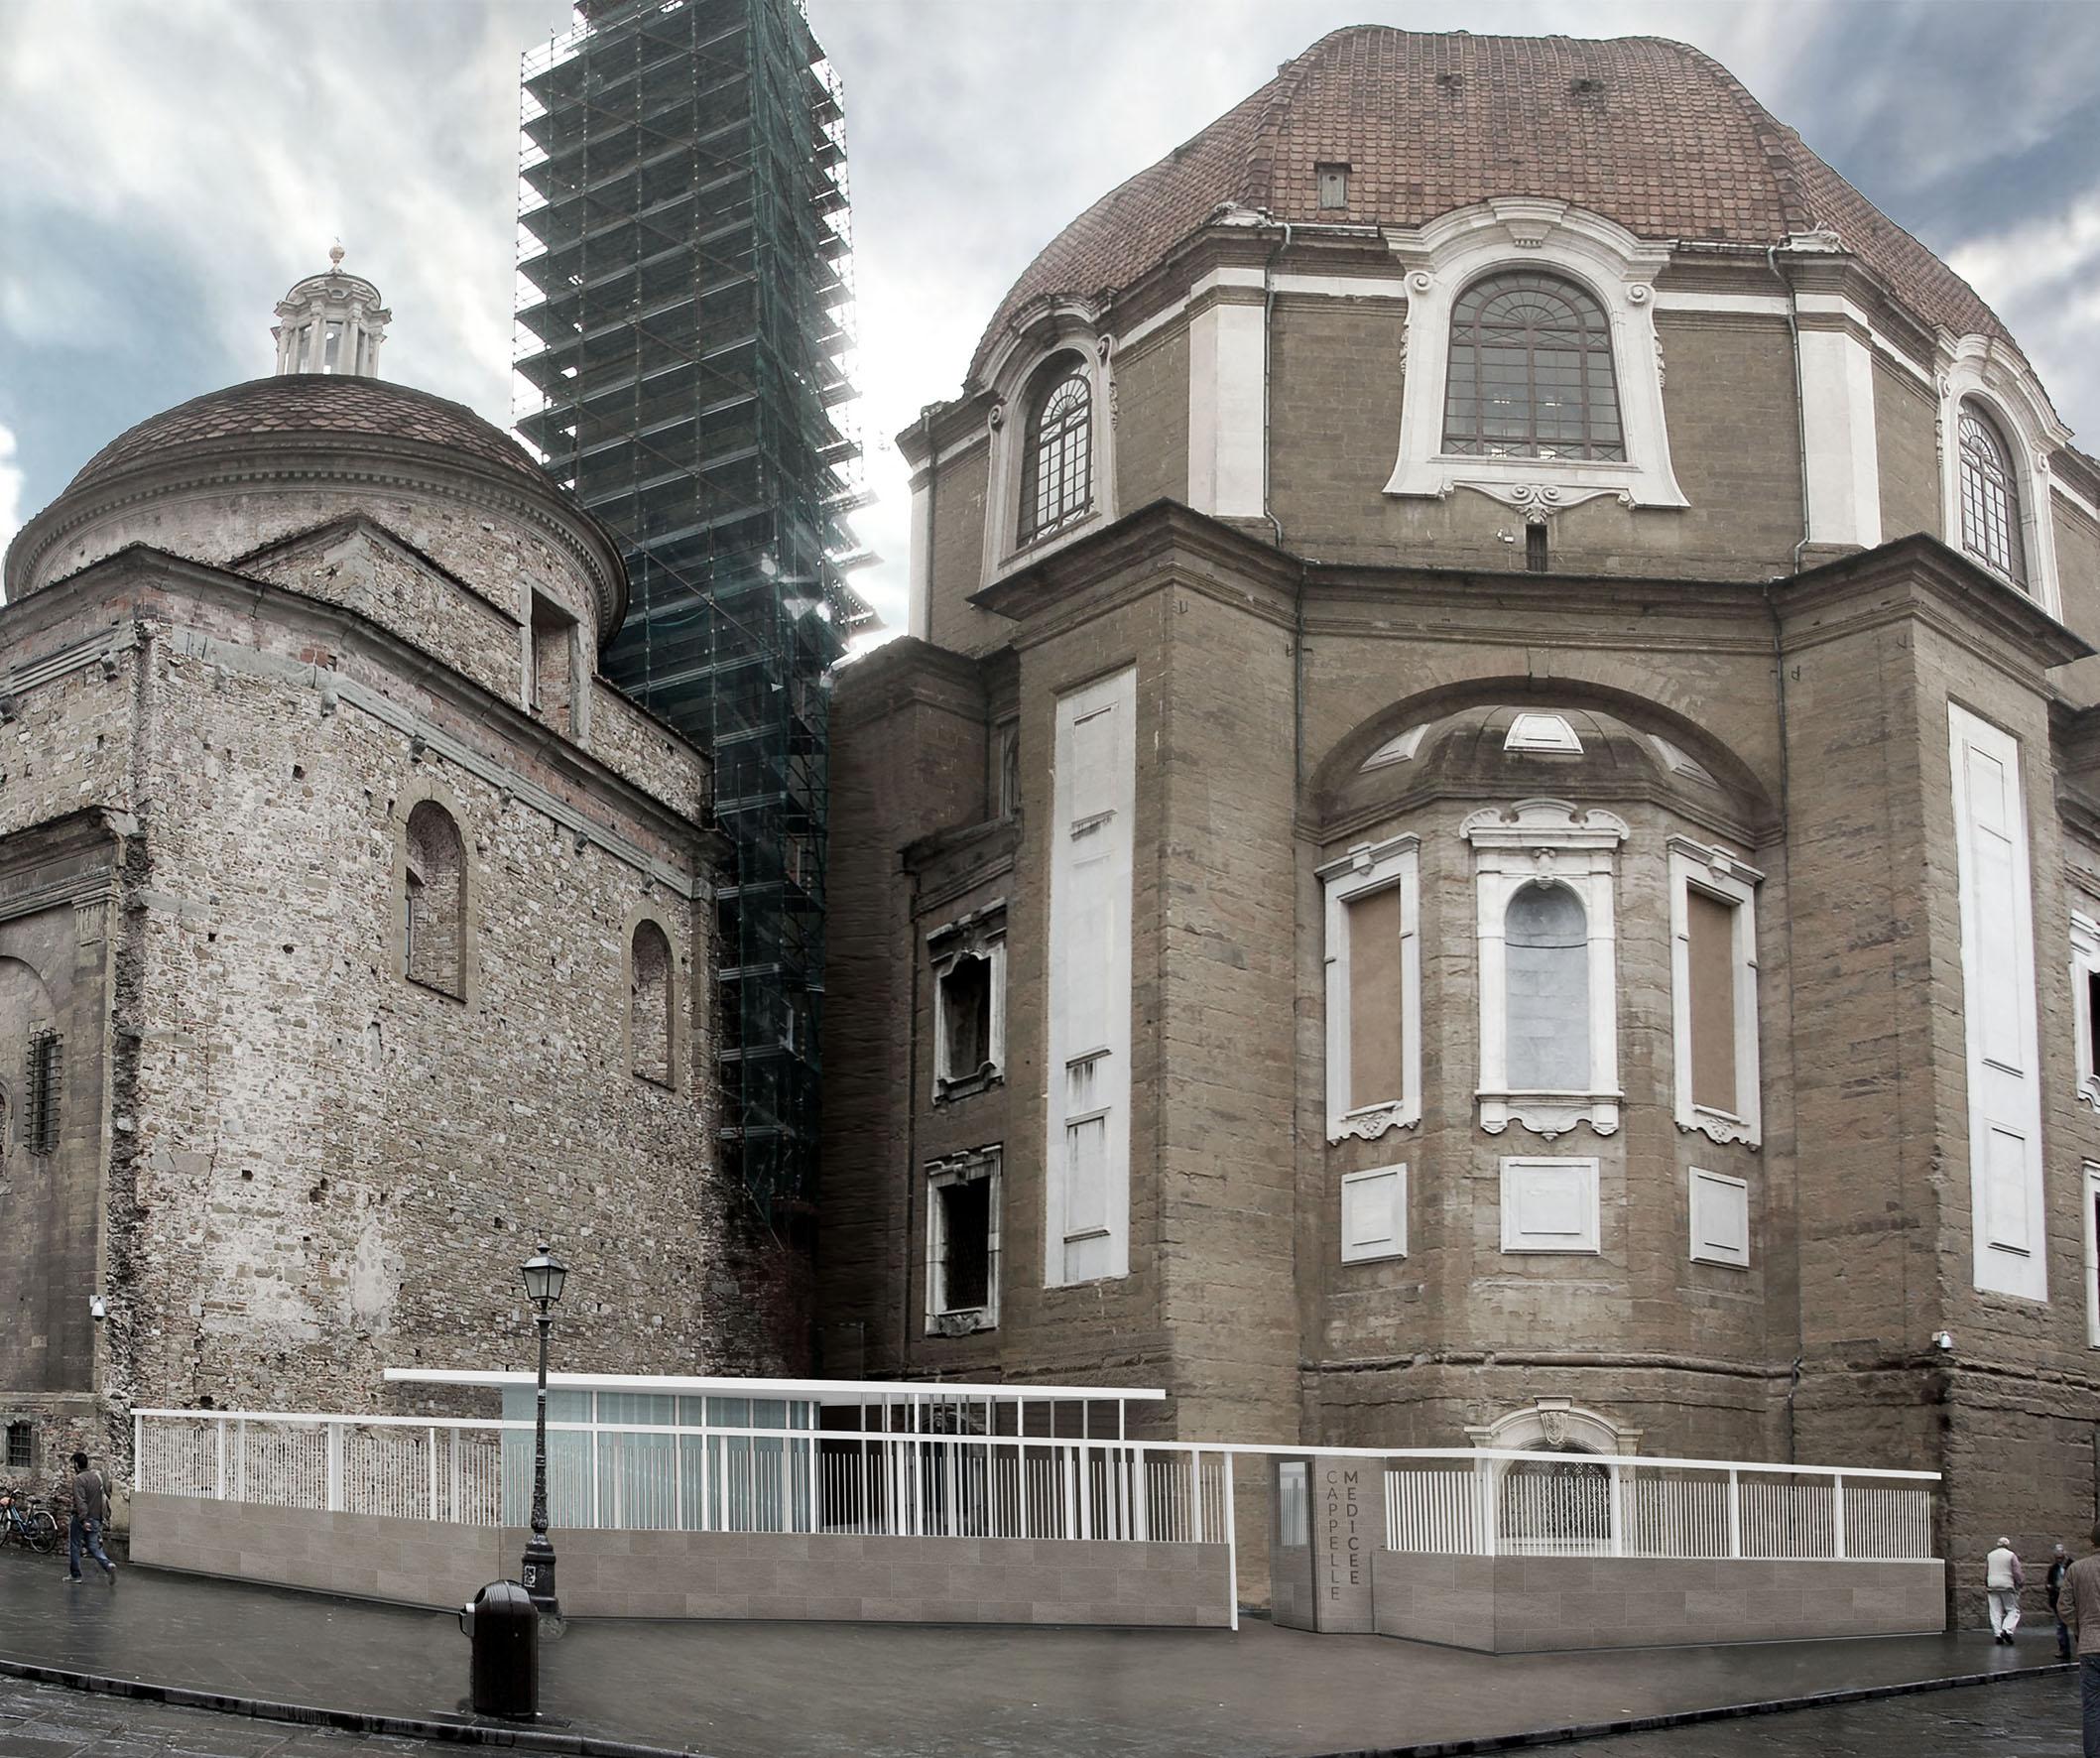 Cappelle Medicee, Firenze